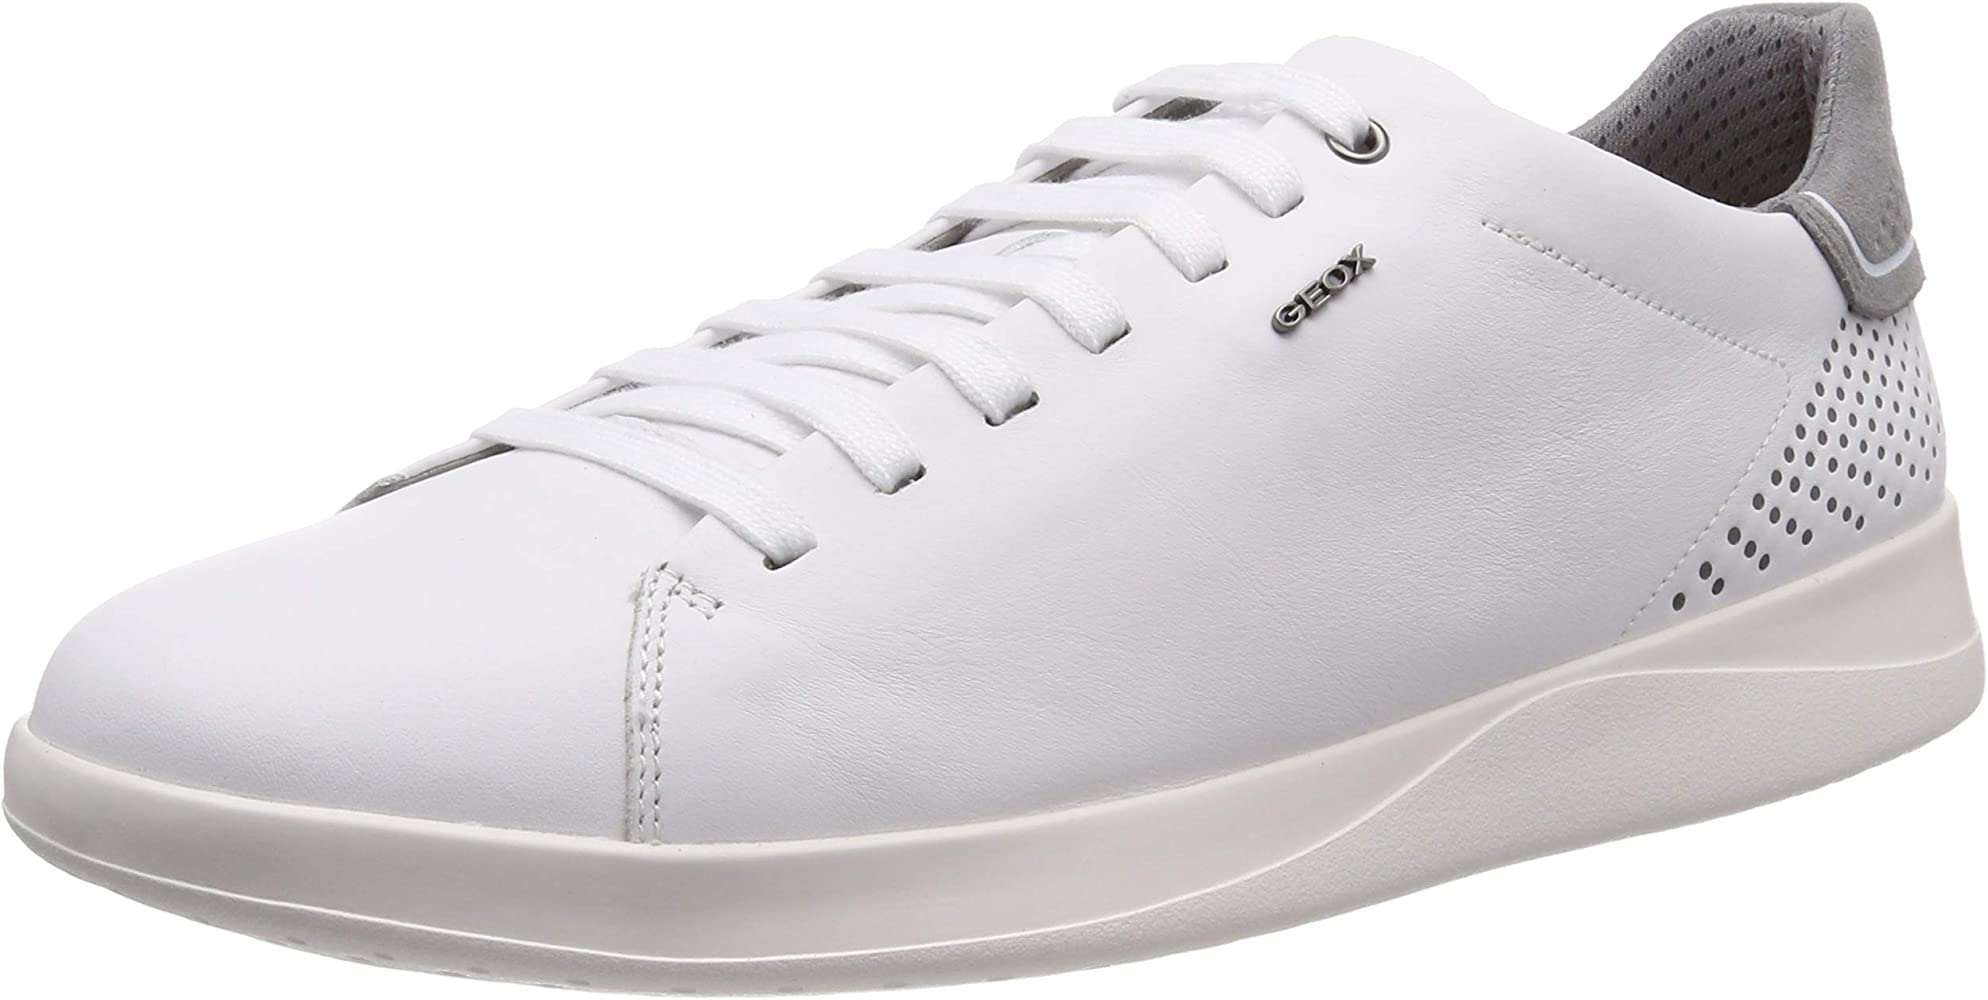 Geox U Kennet B, Baskets Basses Homme, Blanc (White C1000